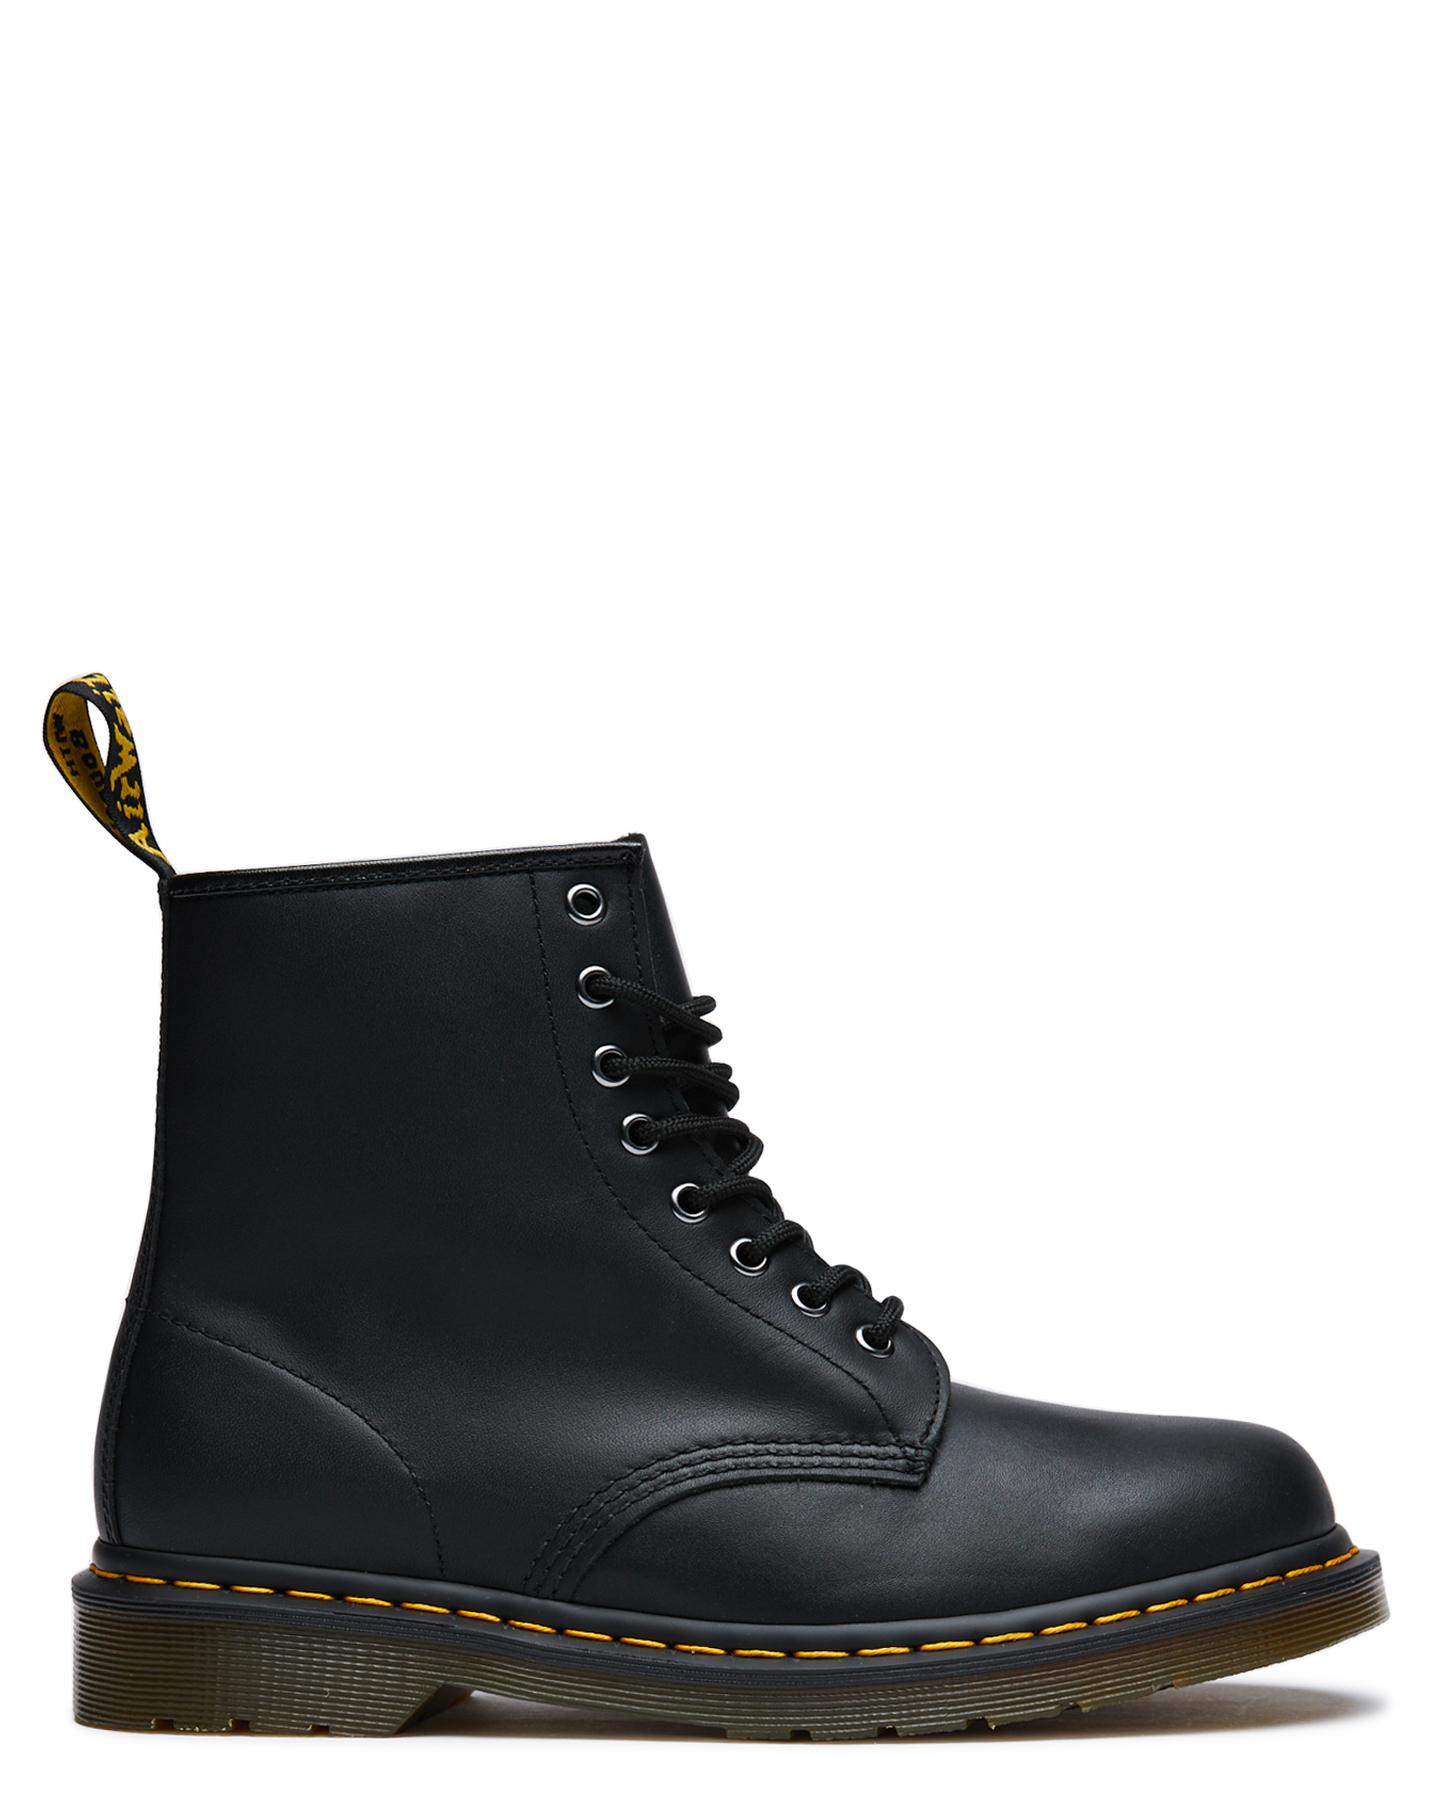 doc martens boots sydney